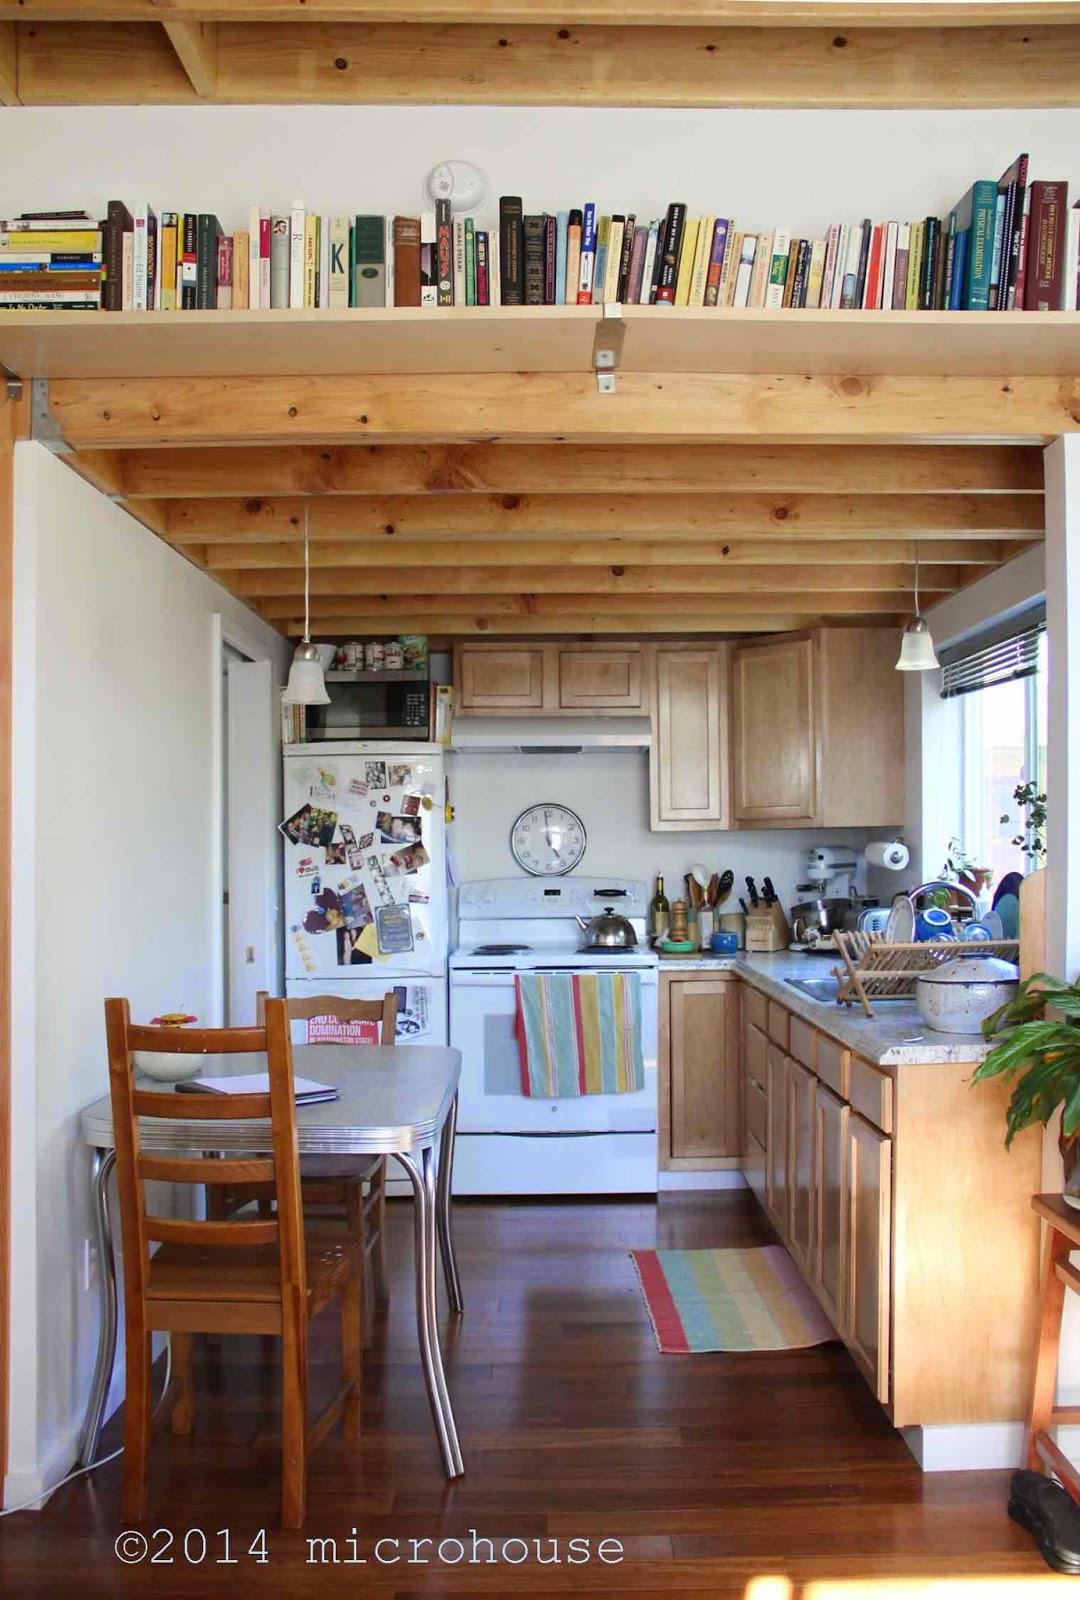 backyard cottage, backyard cottages, microhouse